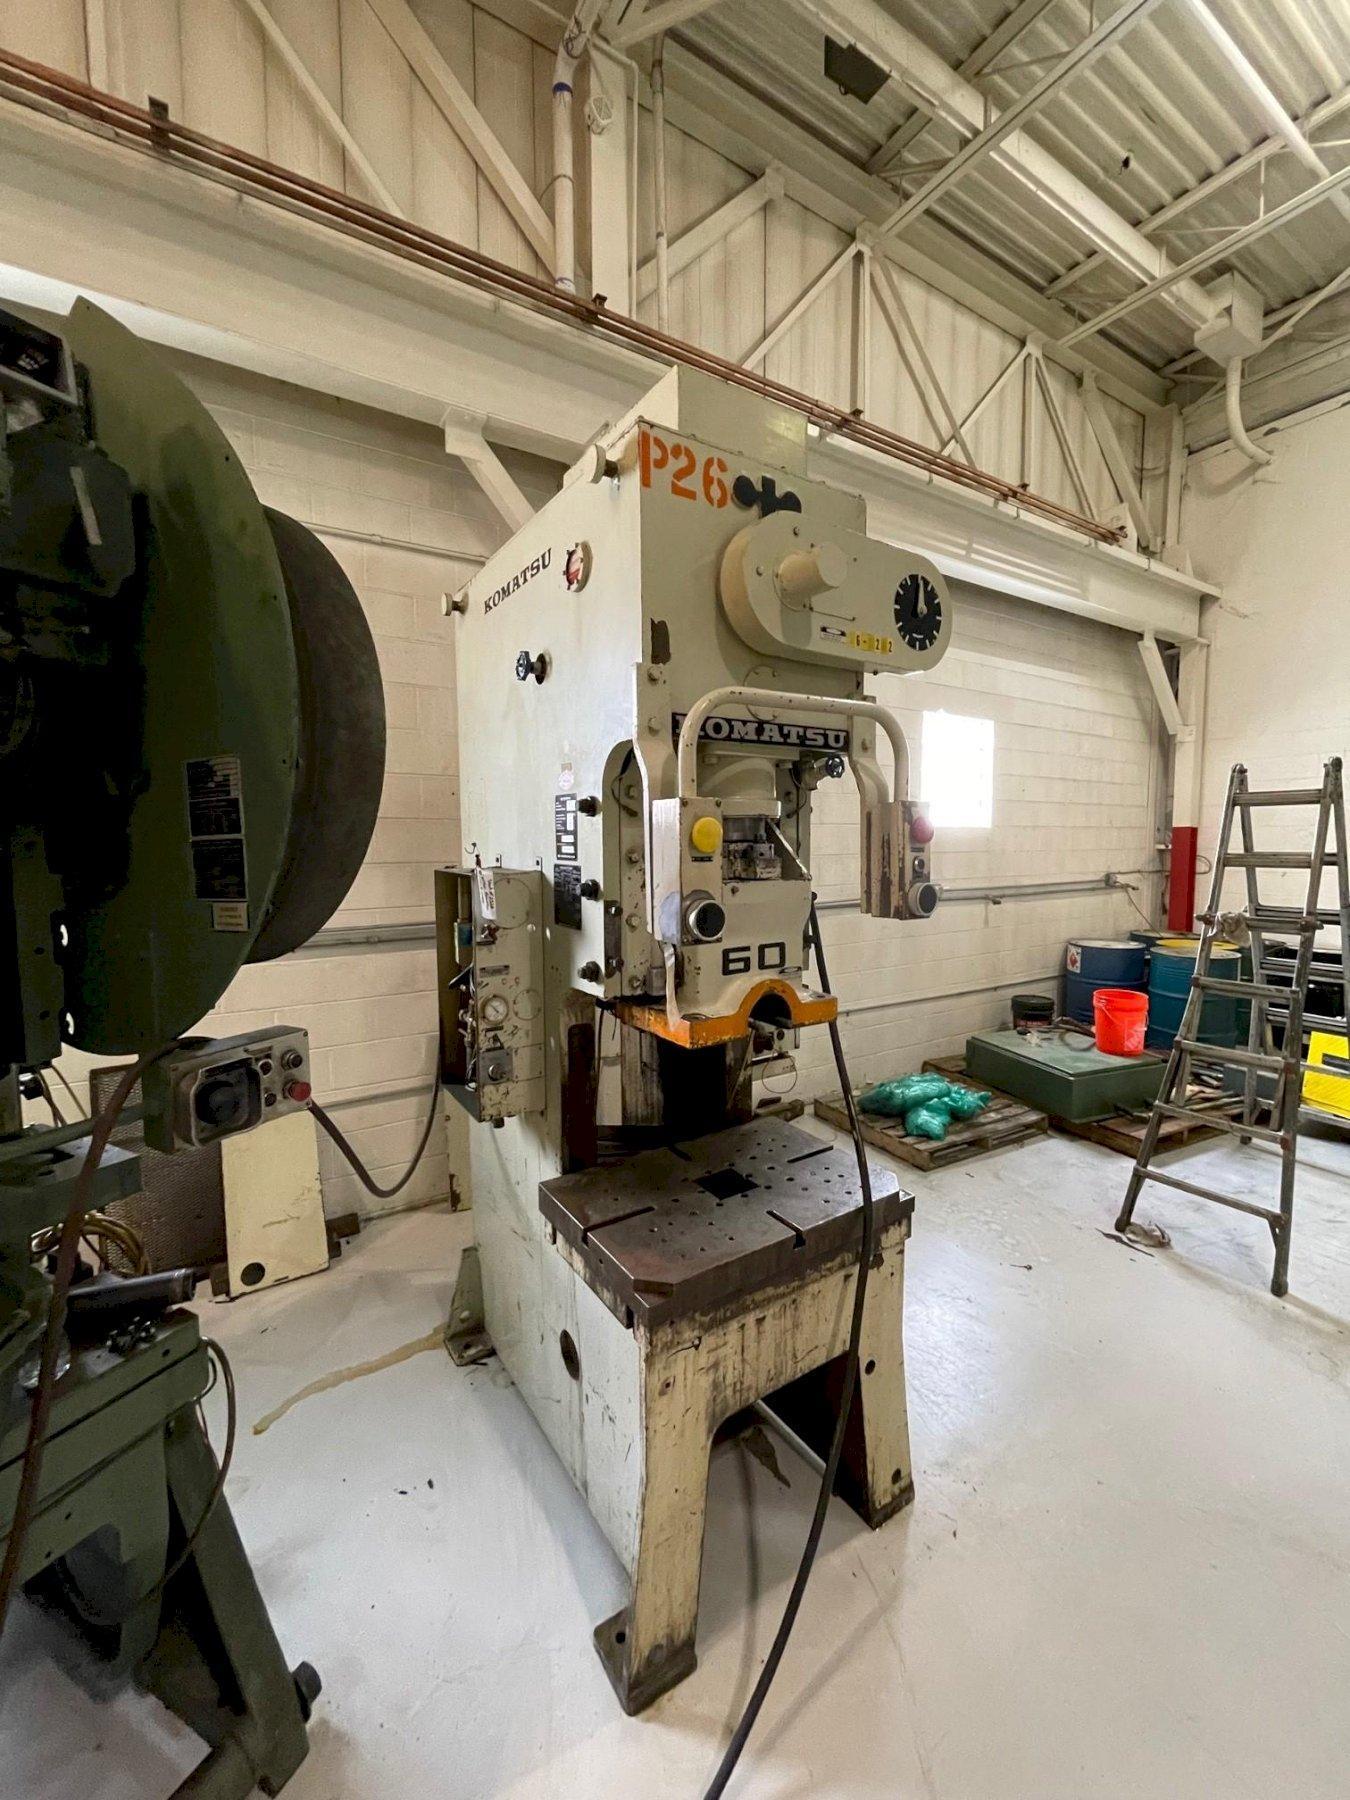 60 Ton KOMATSU OBS-60, C-Frame Press